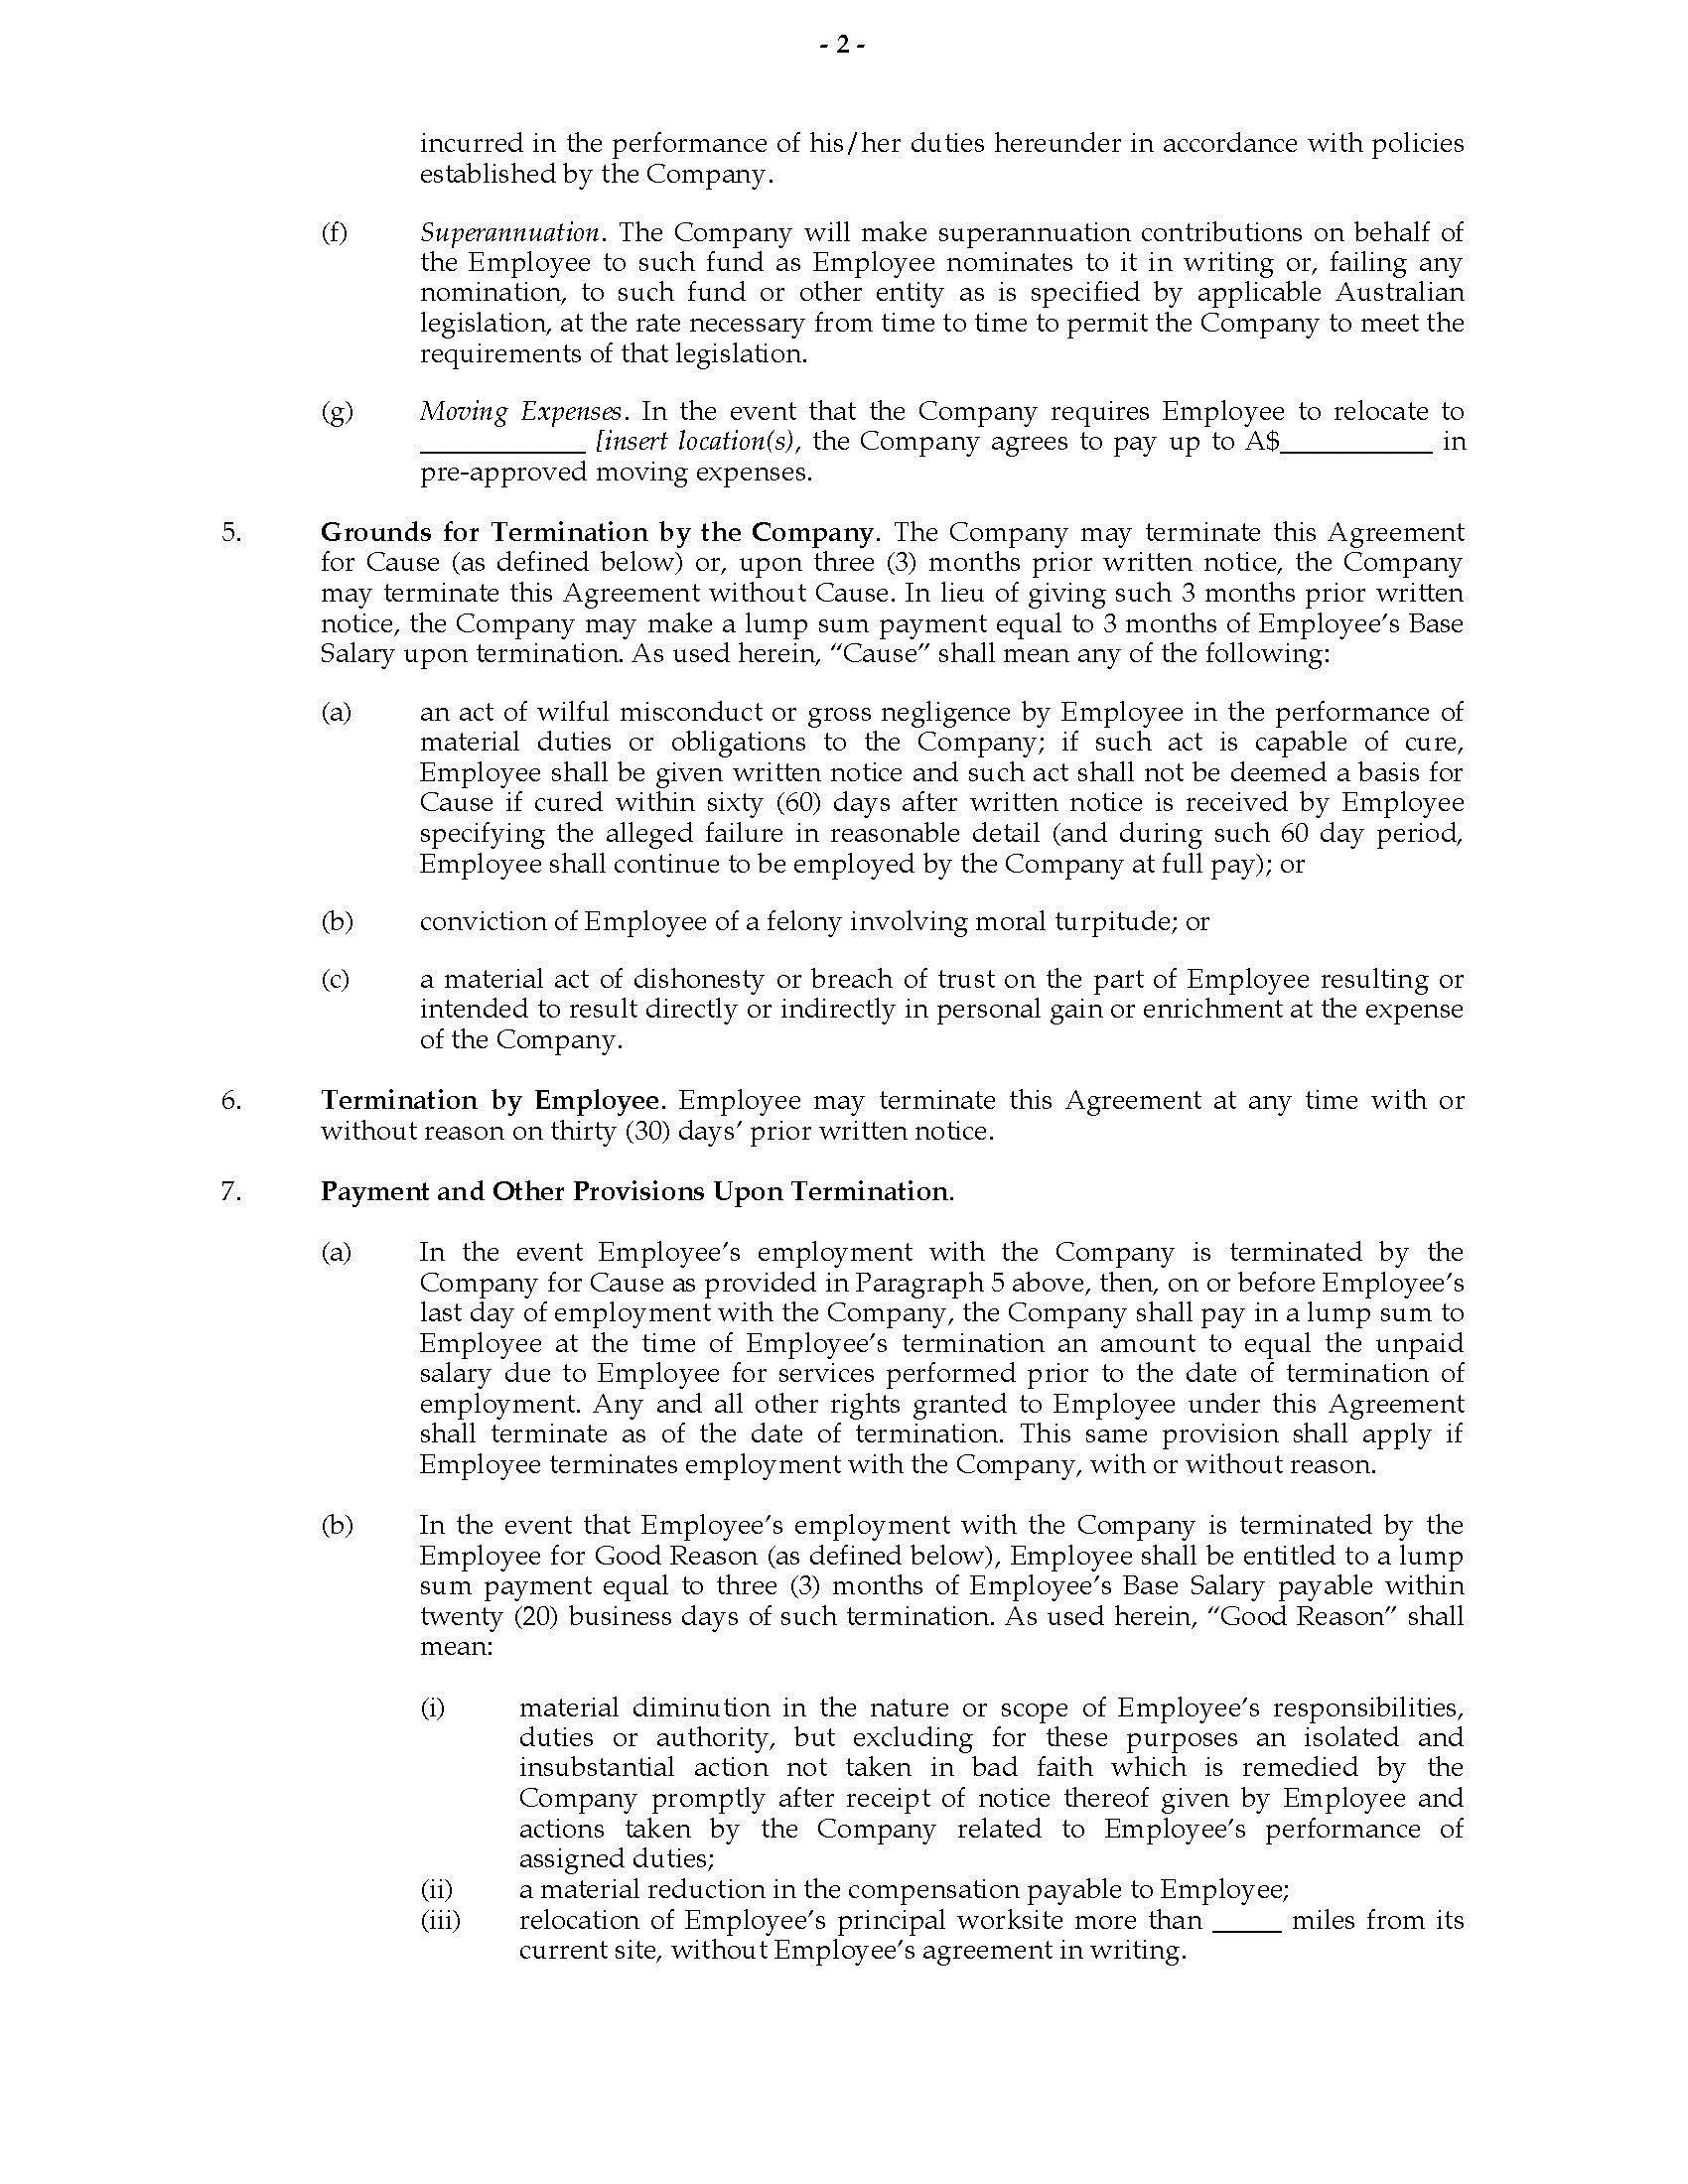 Executive Employment Contract Template Australia